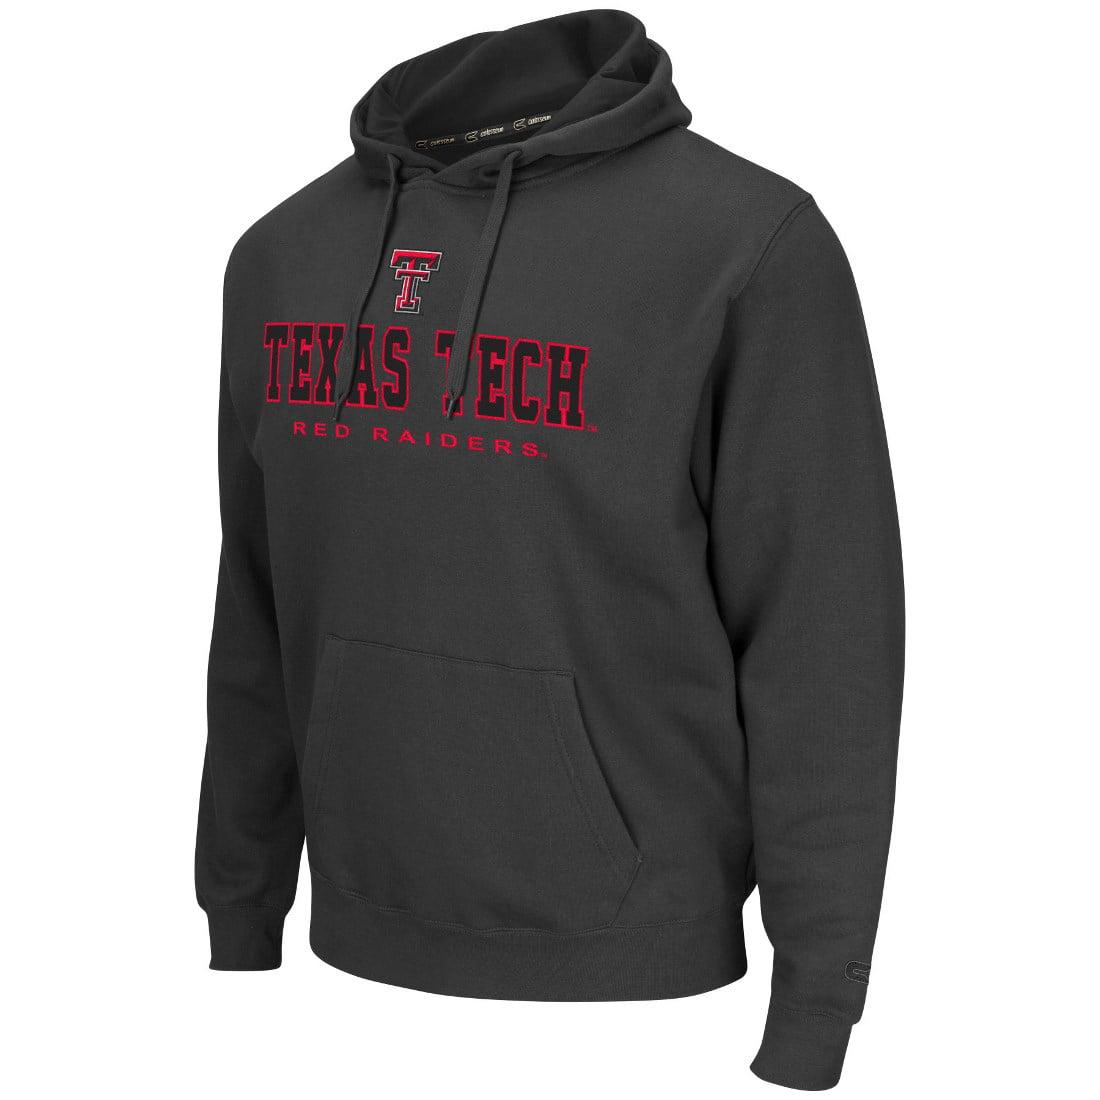 Texas Tech Red Raiders NCAA Zone II Pullover Hooded Men's Sweatshirt - Charcoal